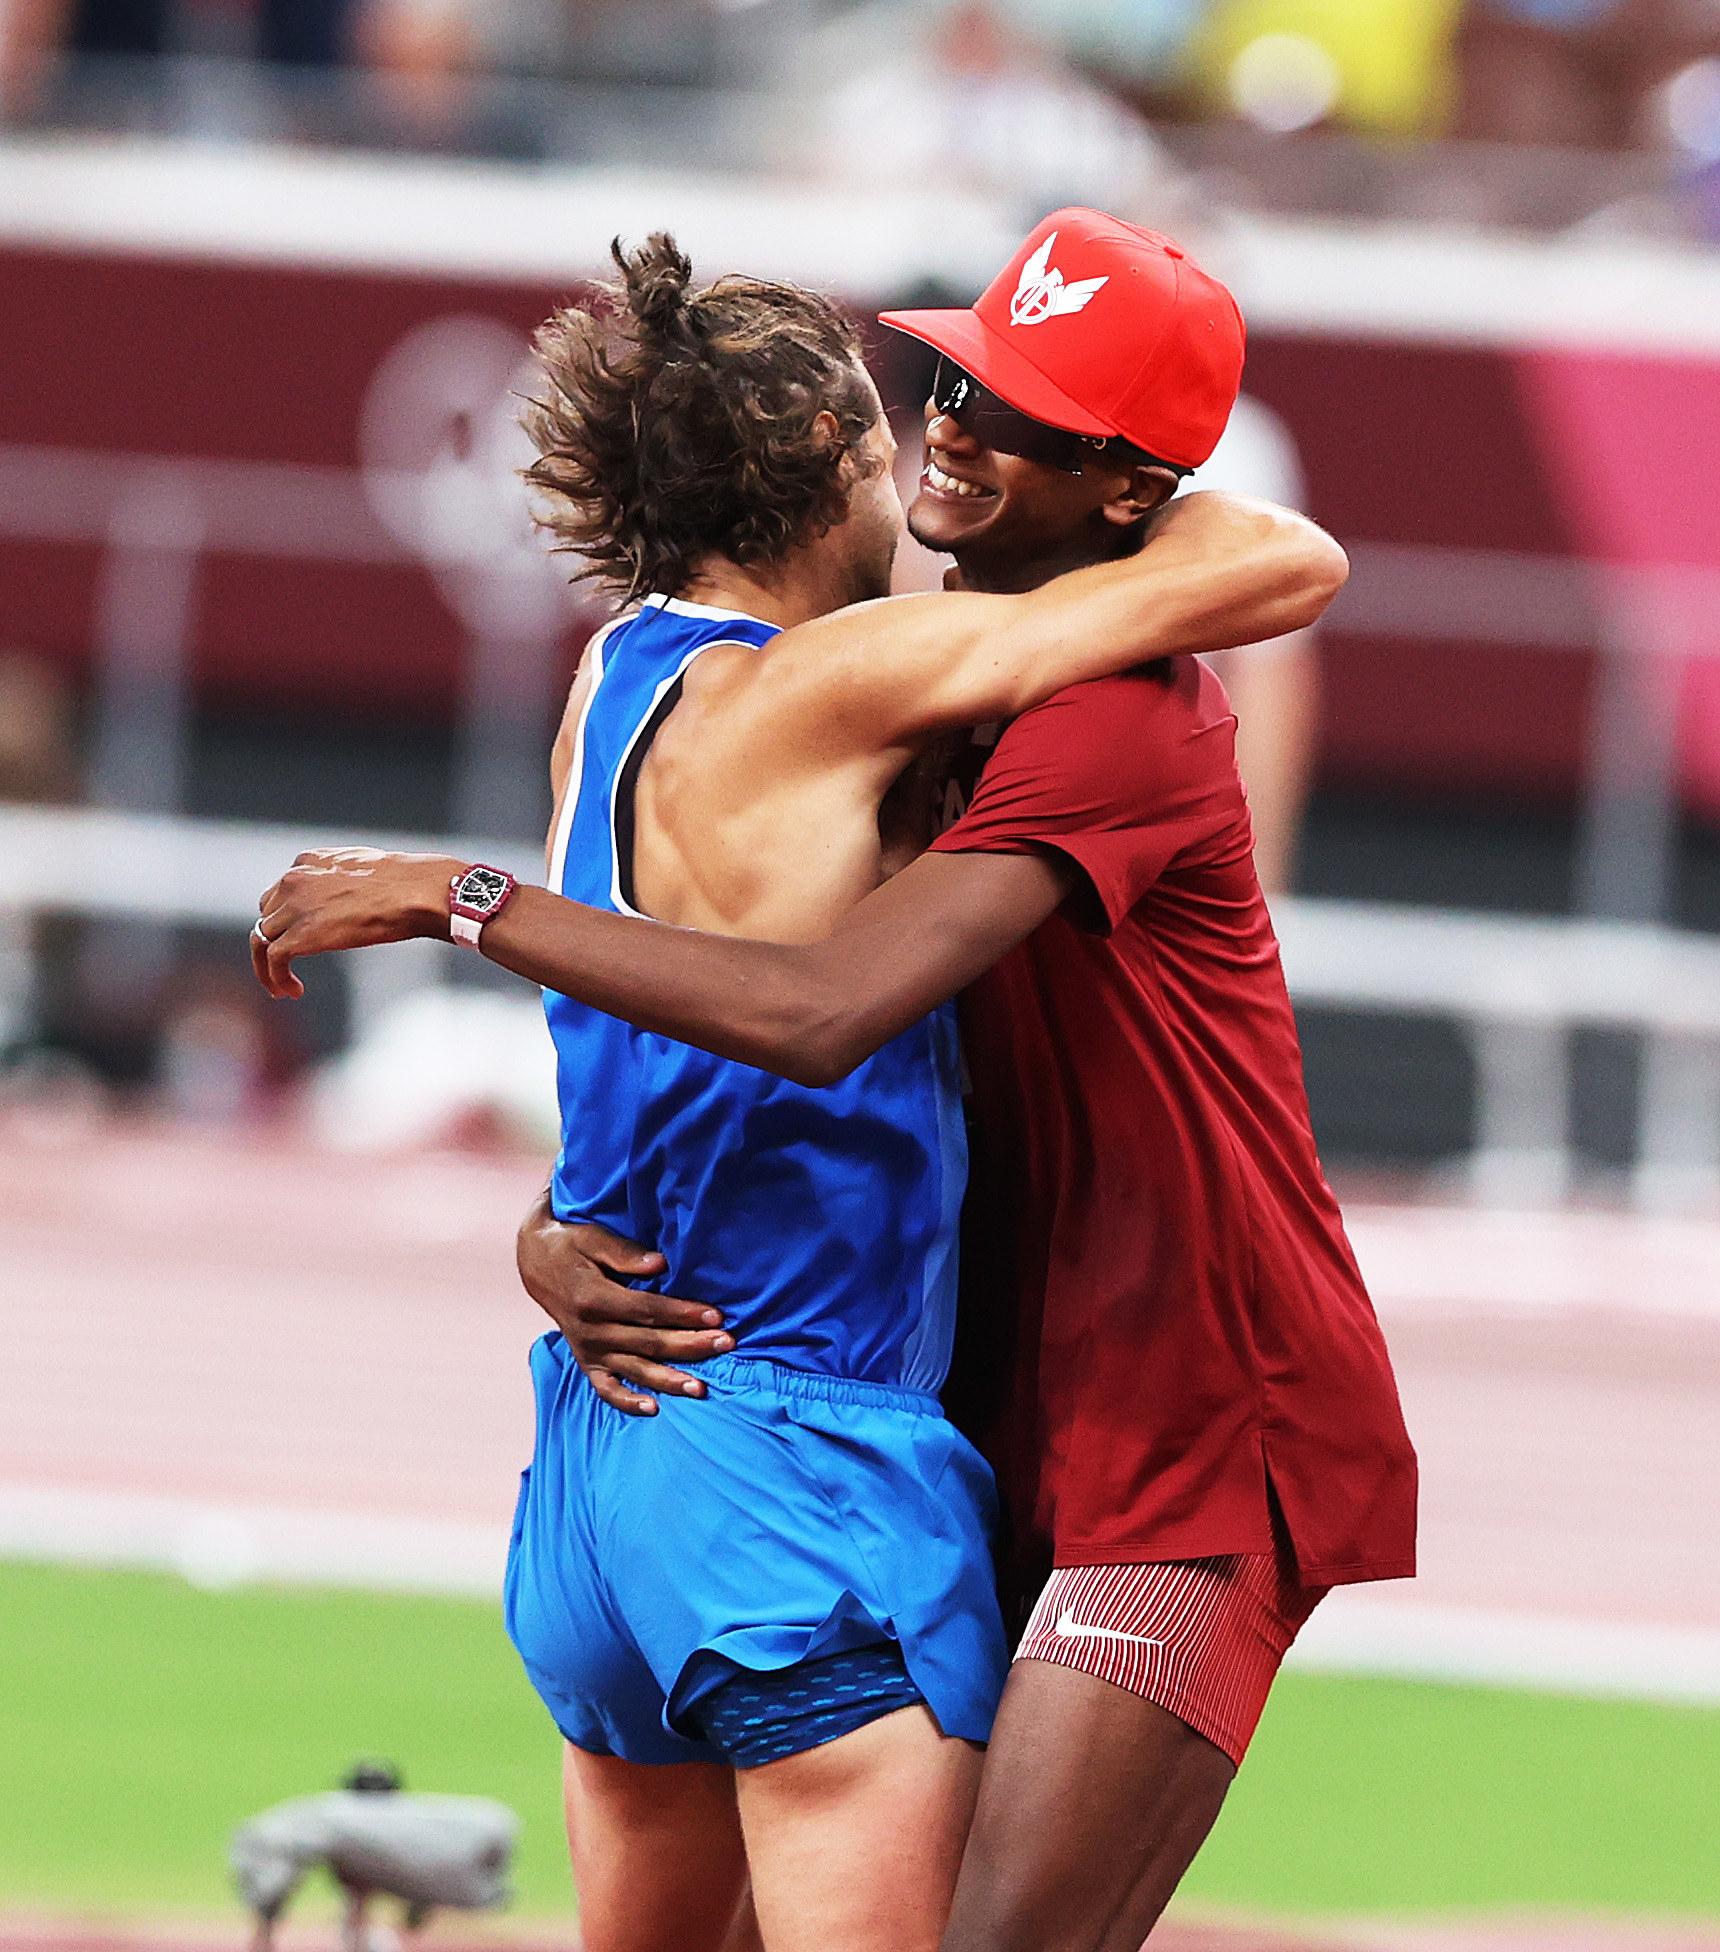 Tamberi and Barshim embrace